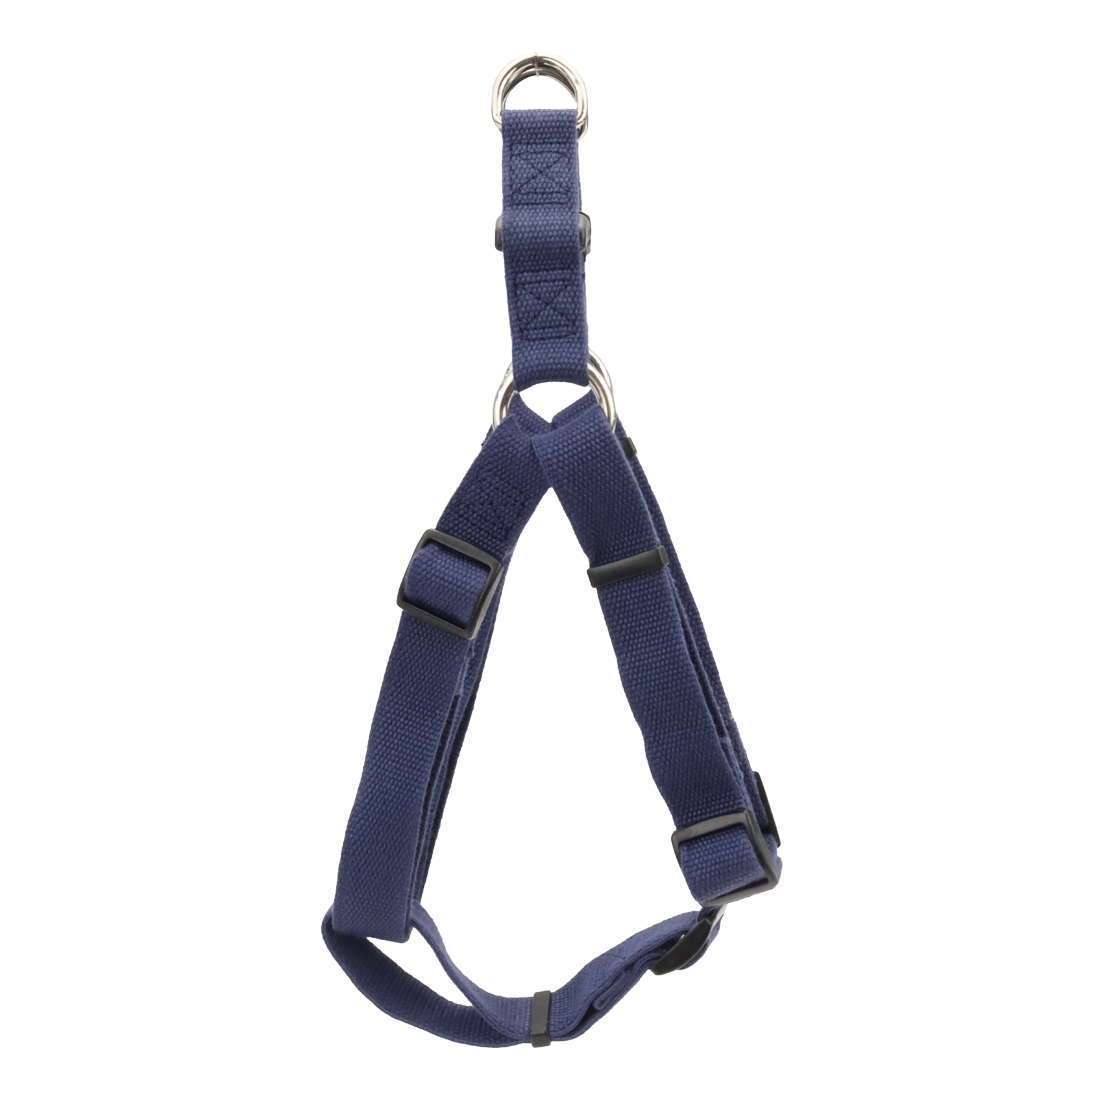 New Earth Soy Comfort Wrap Adjustable Dog Harness, Indigo, 3/4-inx20-30-in